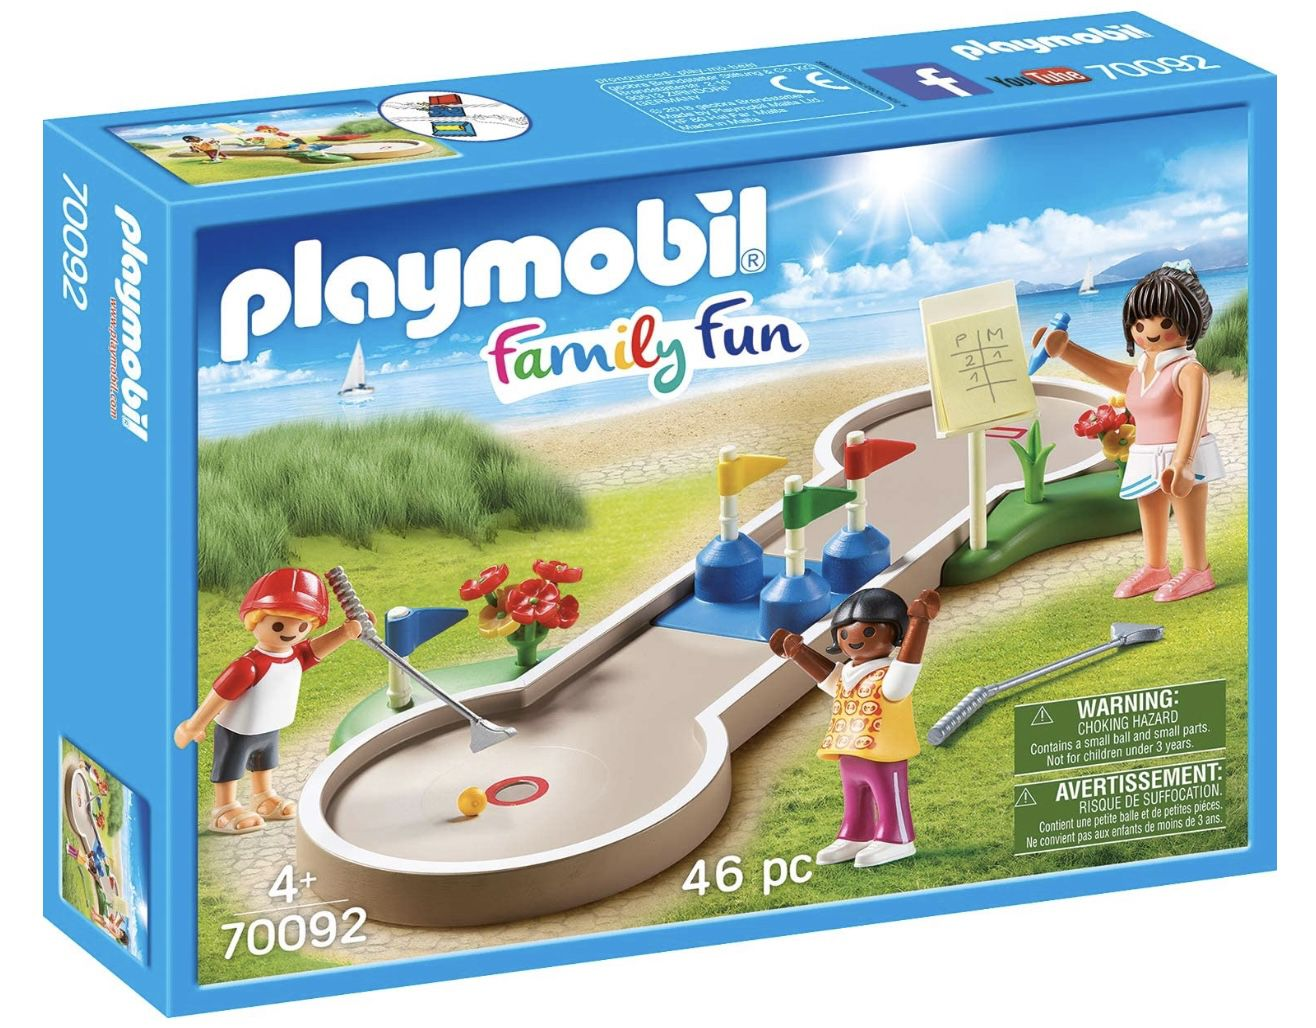 PLAYMOBIL 70092 – Family Fun Minigolf für 6,49€ (statt 11€) – Prime